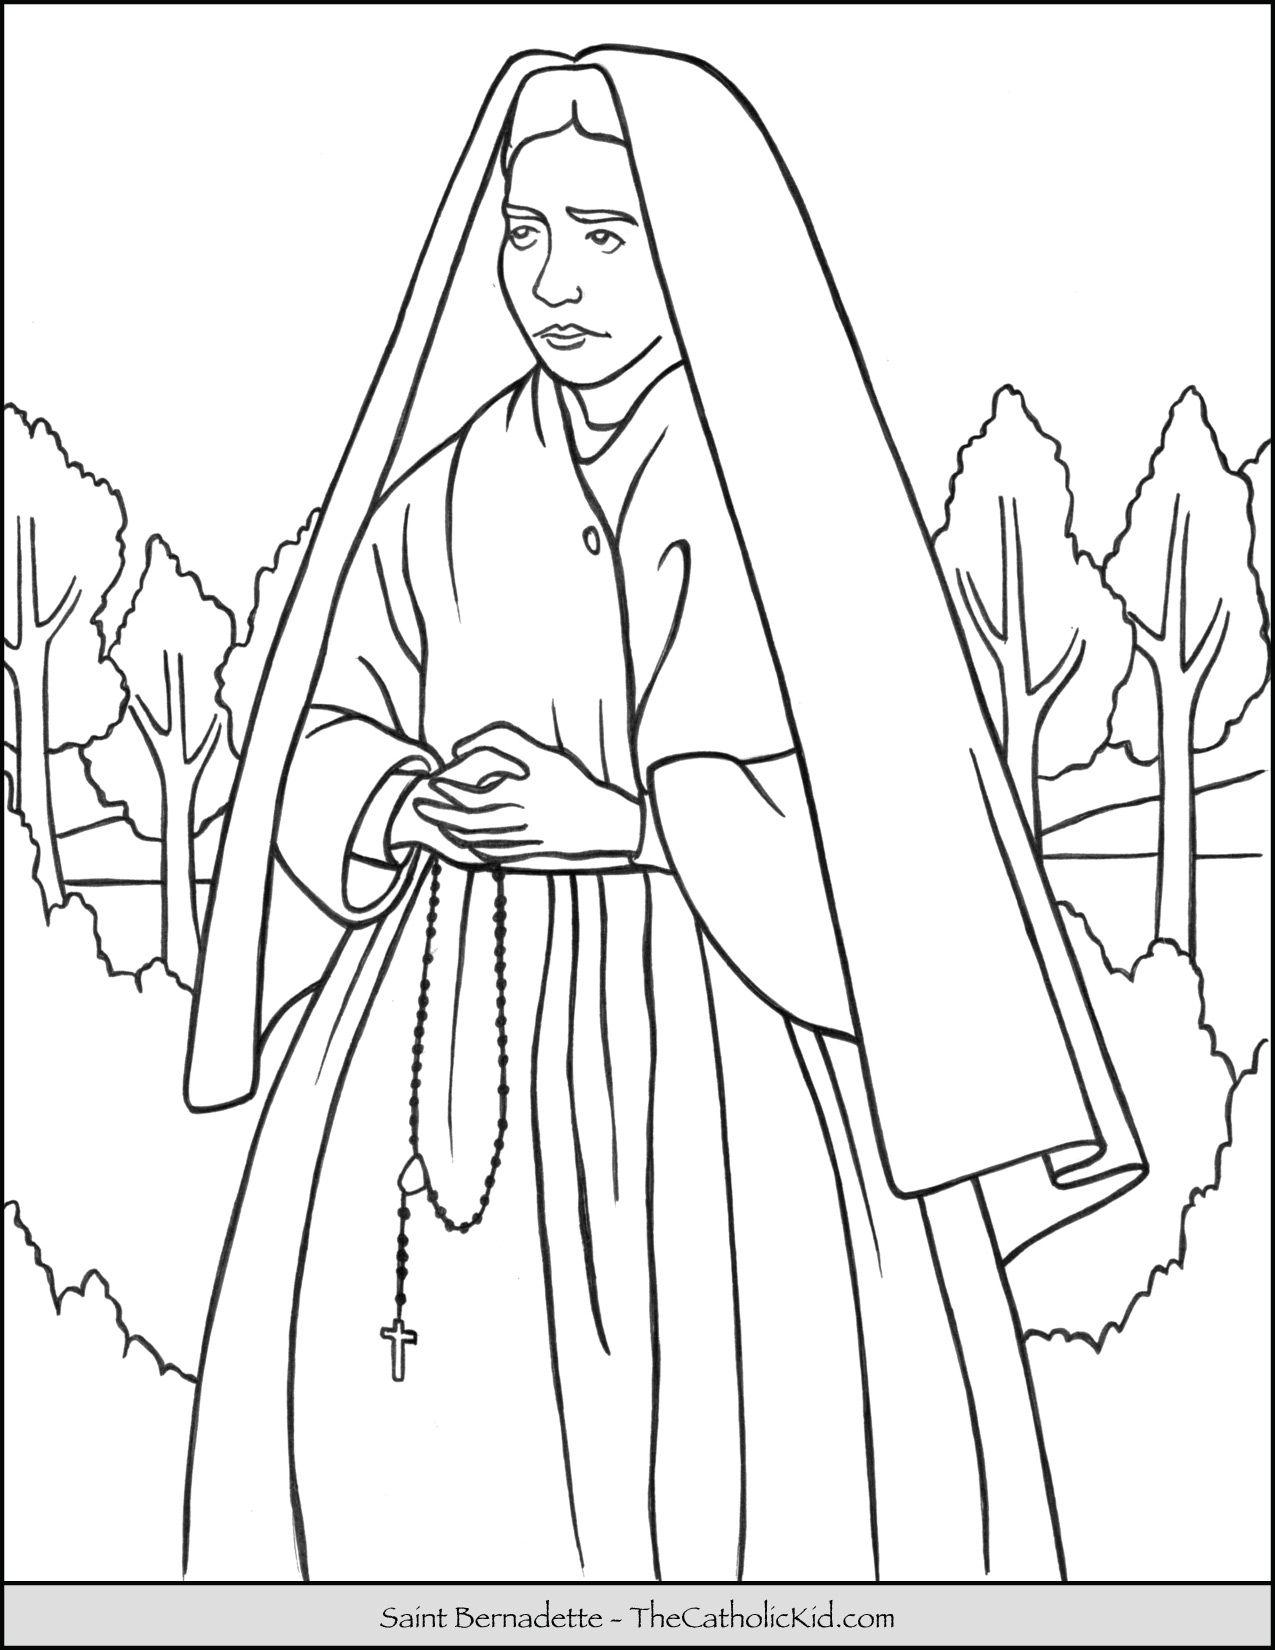 Saint Bernadette Coloring Page Thecatholickid Com Coloring Pages Catholic Coloring Saint Coloring